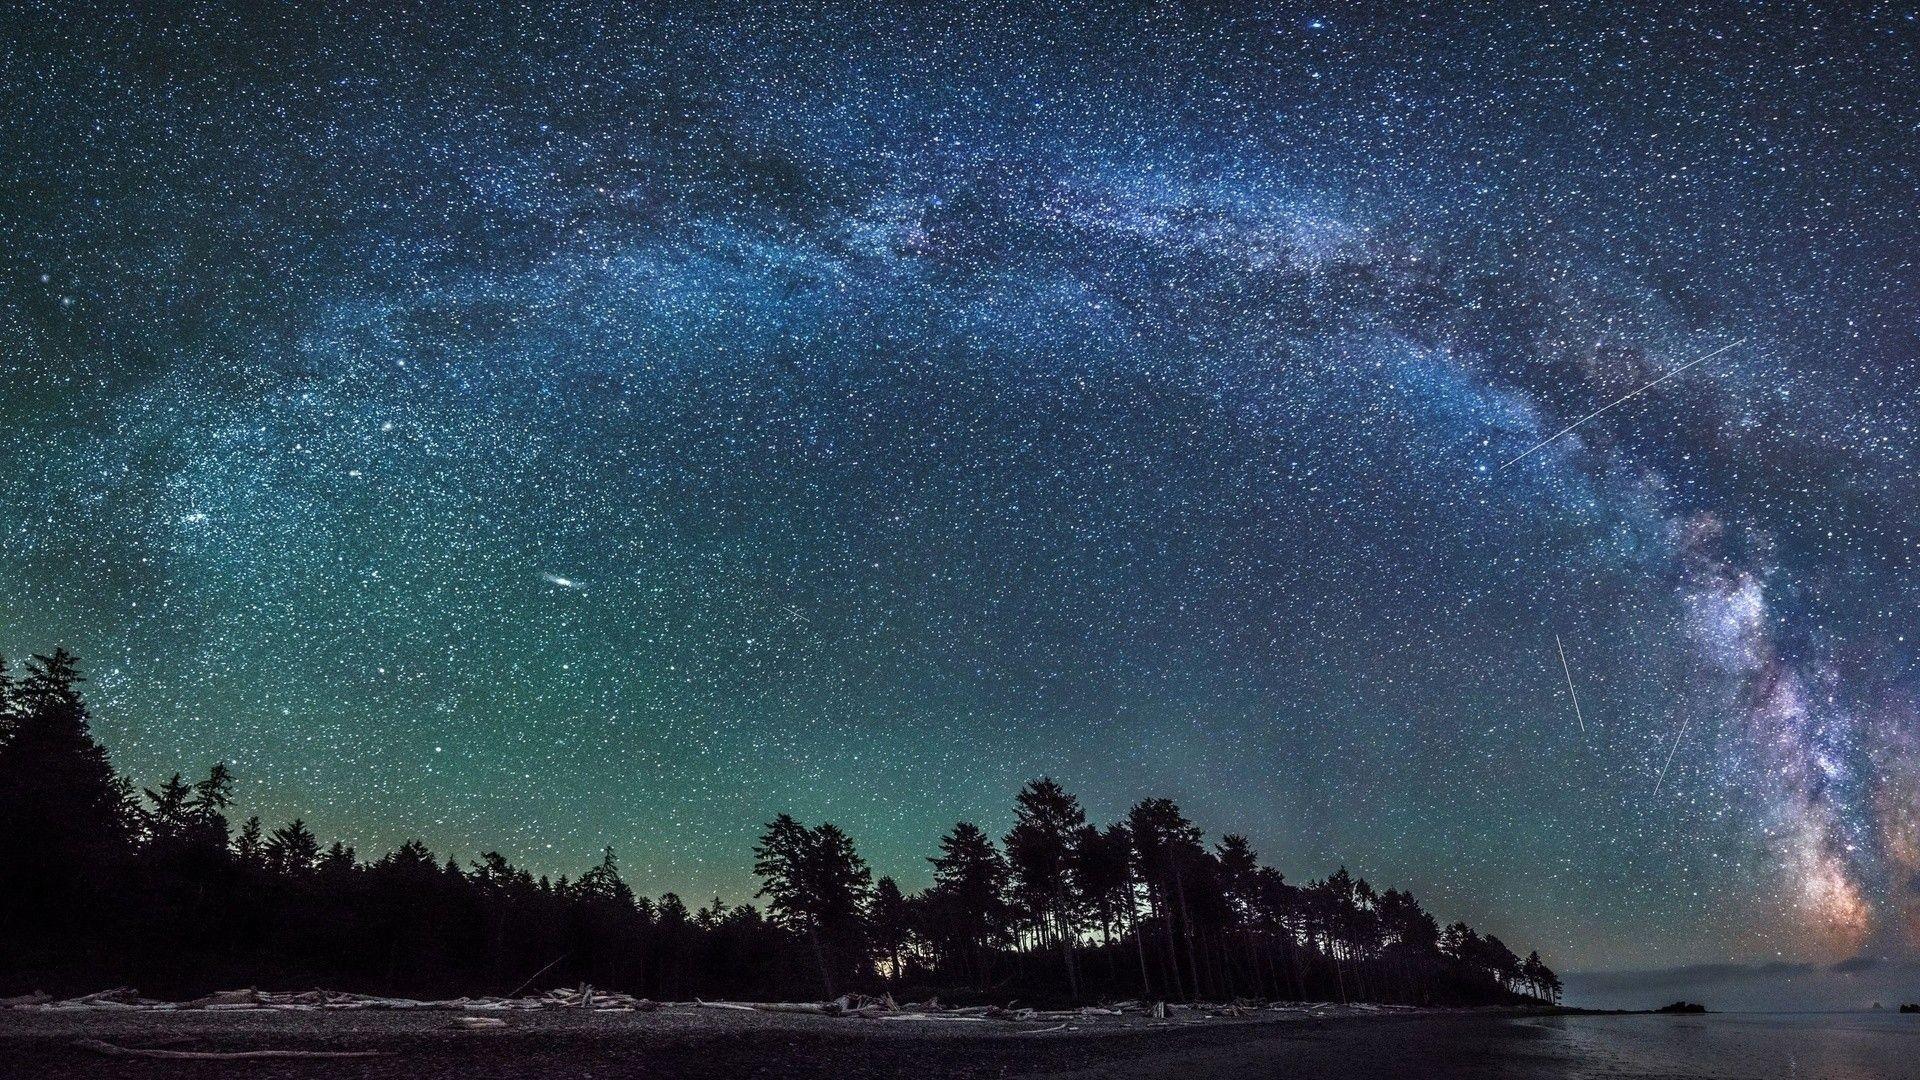 Milky Way Backgrounds – Wallpaper Cave